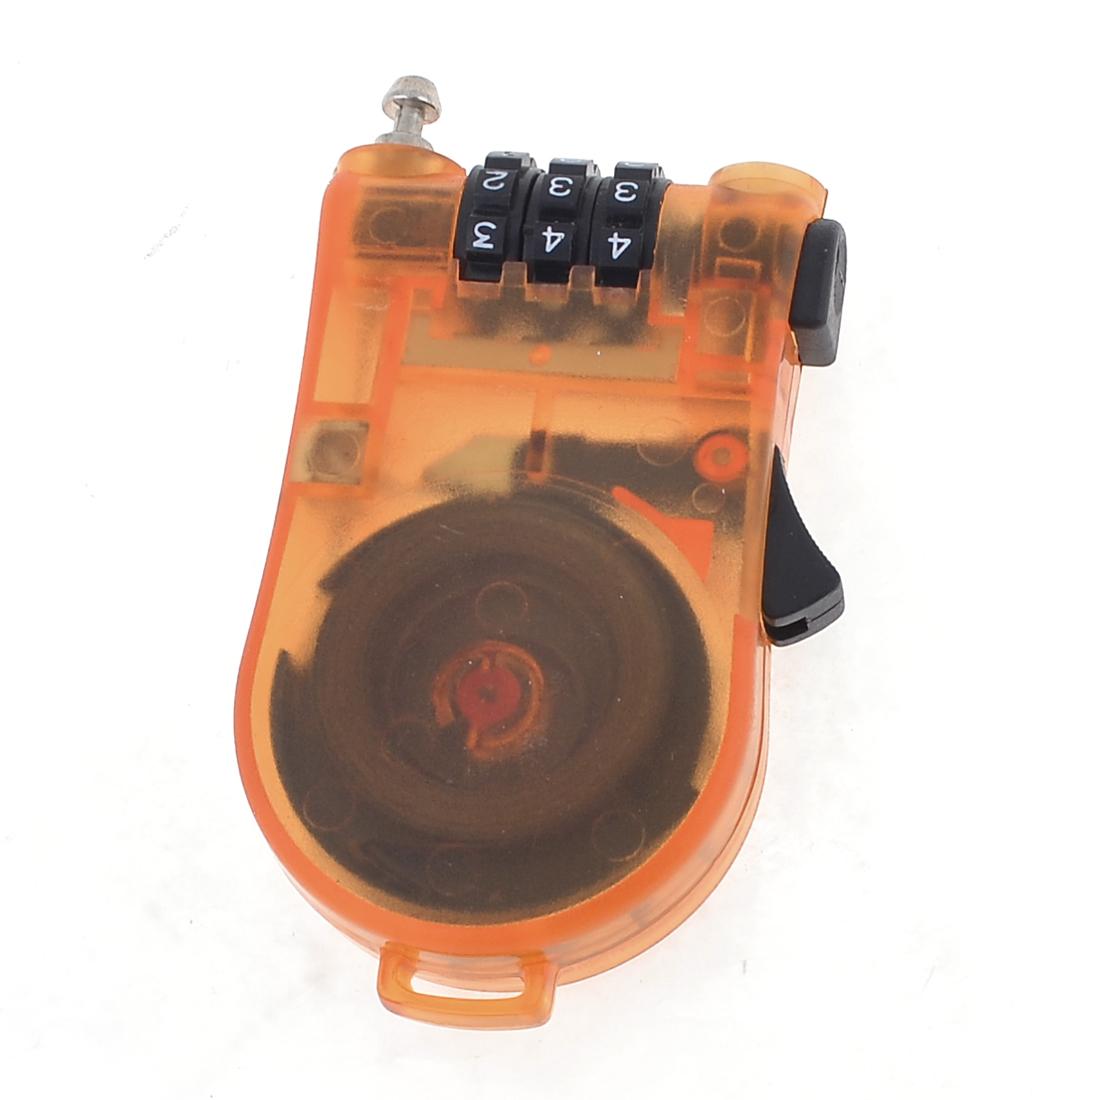 Orange 3 Digits 0-9 Number Resettable Luggage Coded Lock Padlock